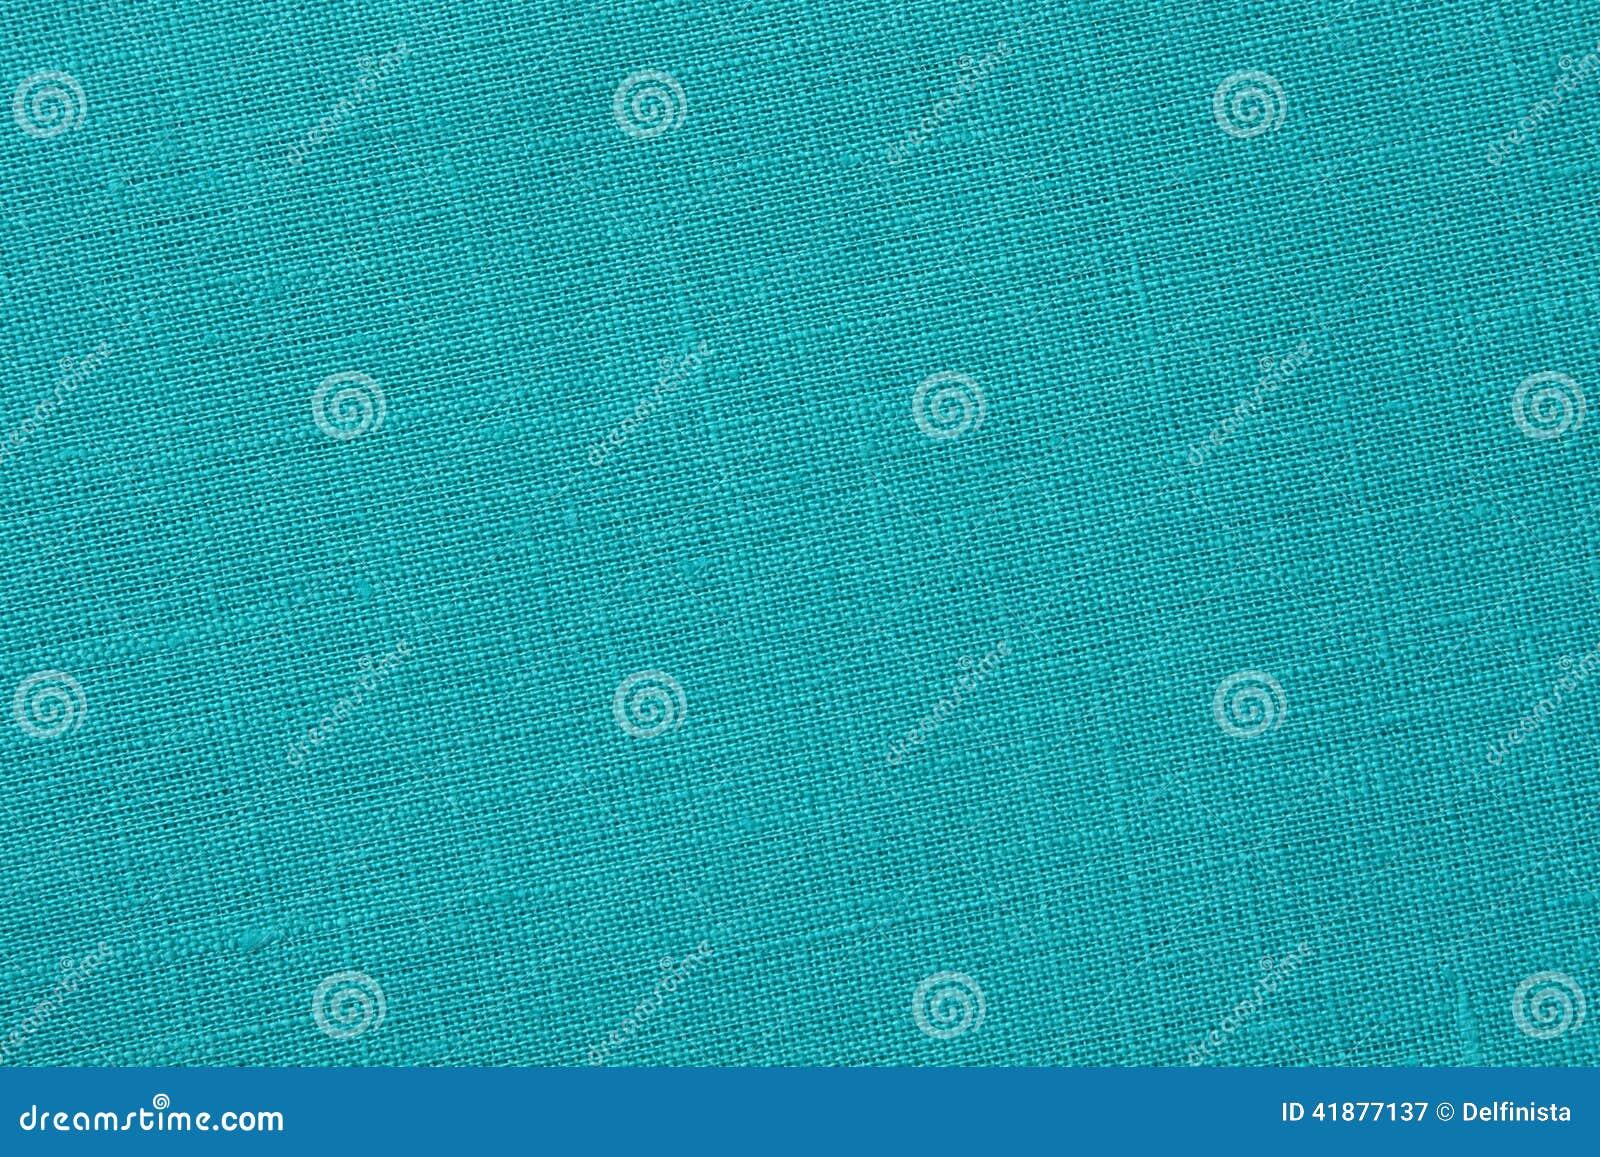 Backround de turquoise - toile de toile - photo courante